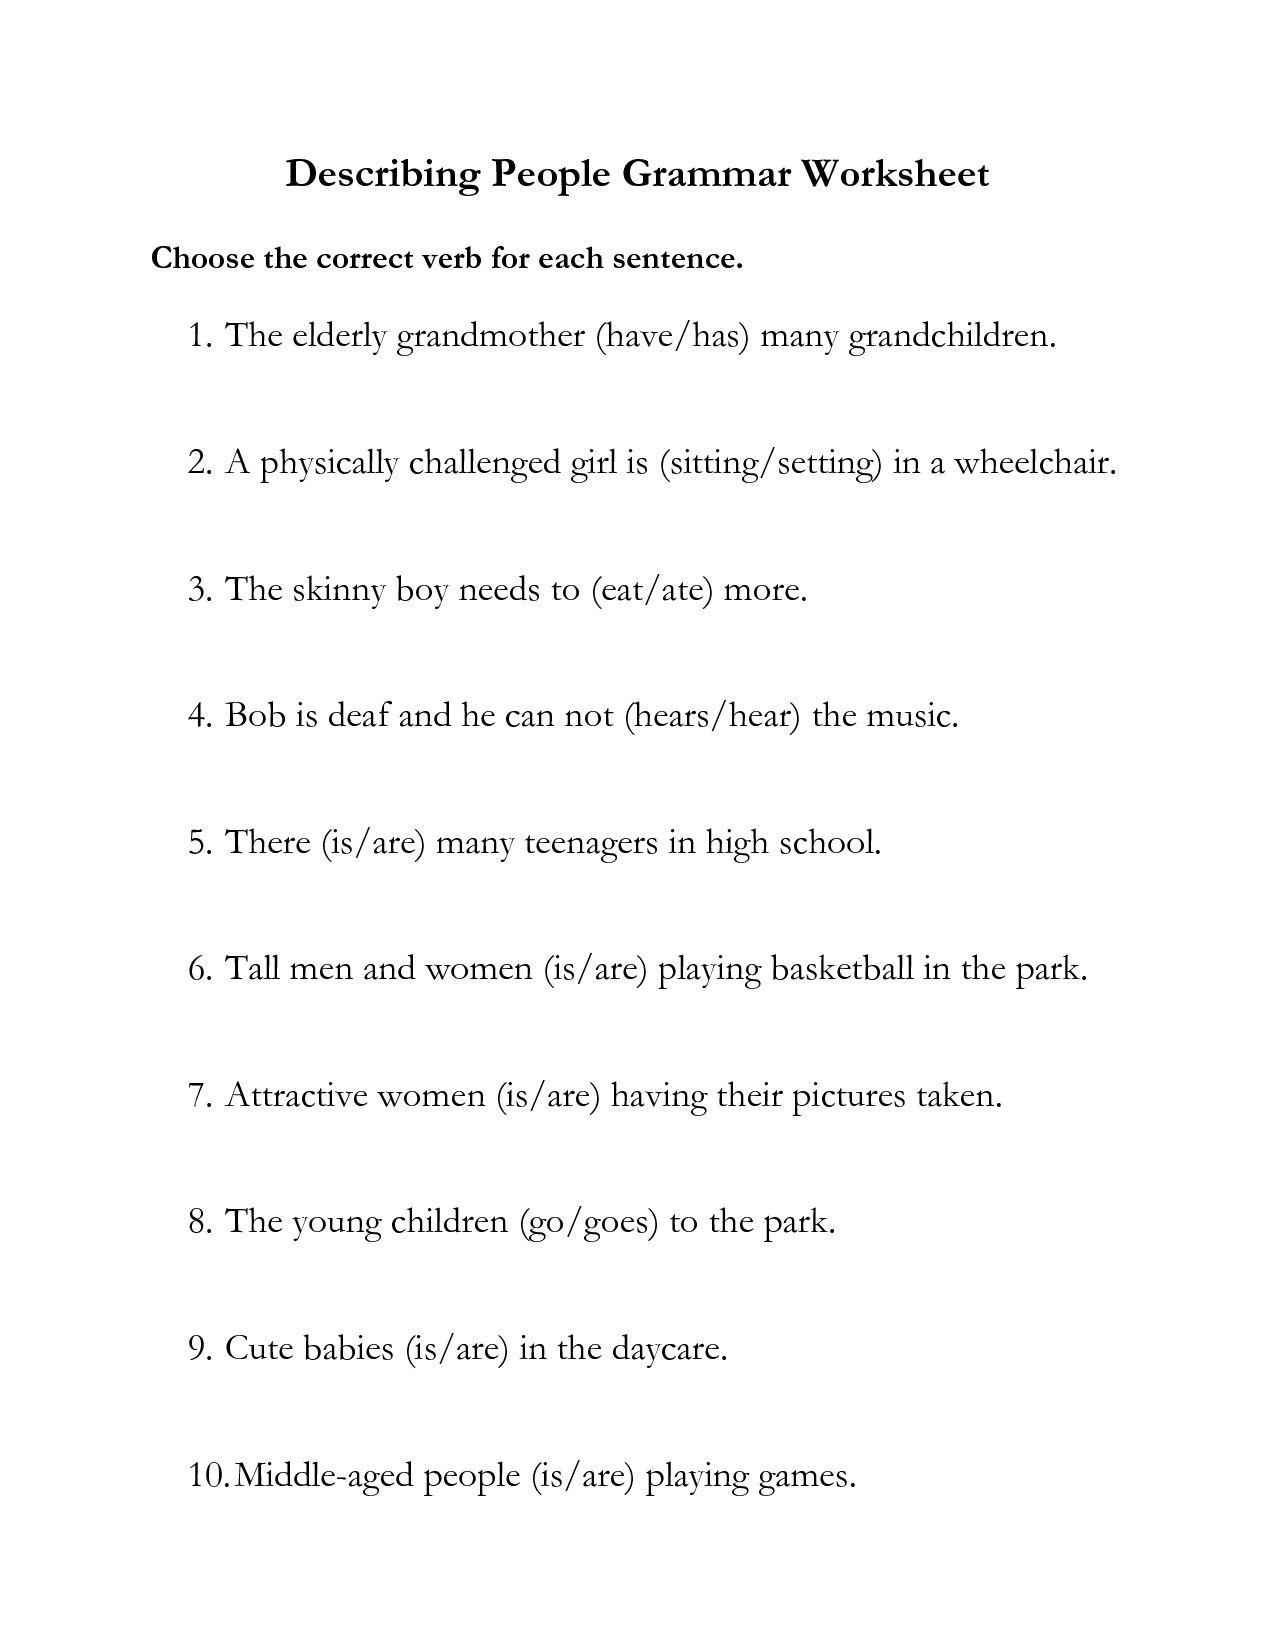 Grammar Worksheets For Middle School In